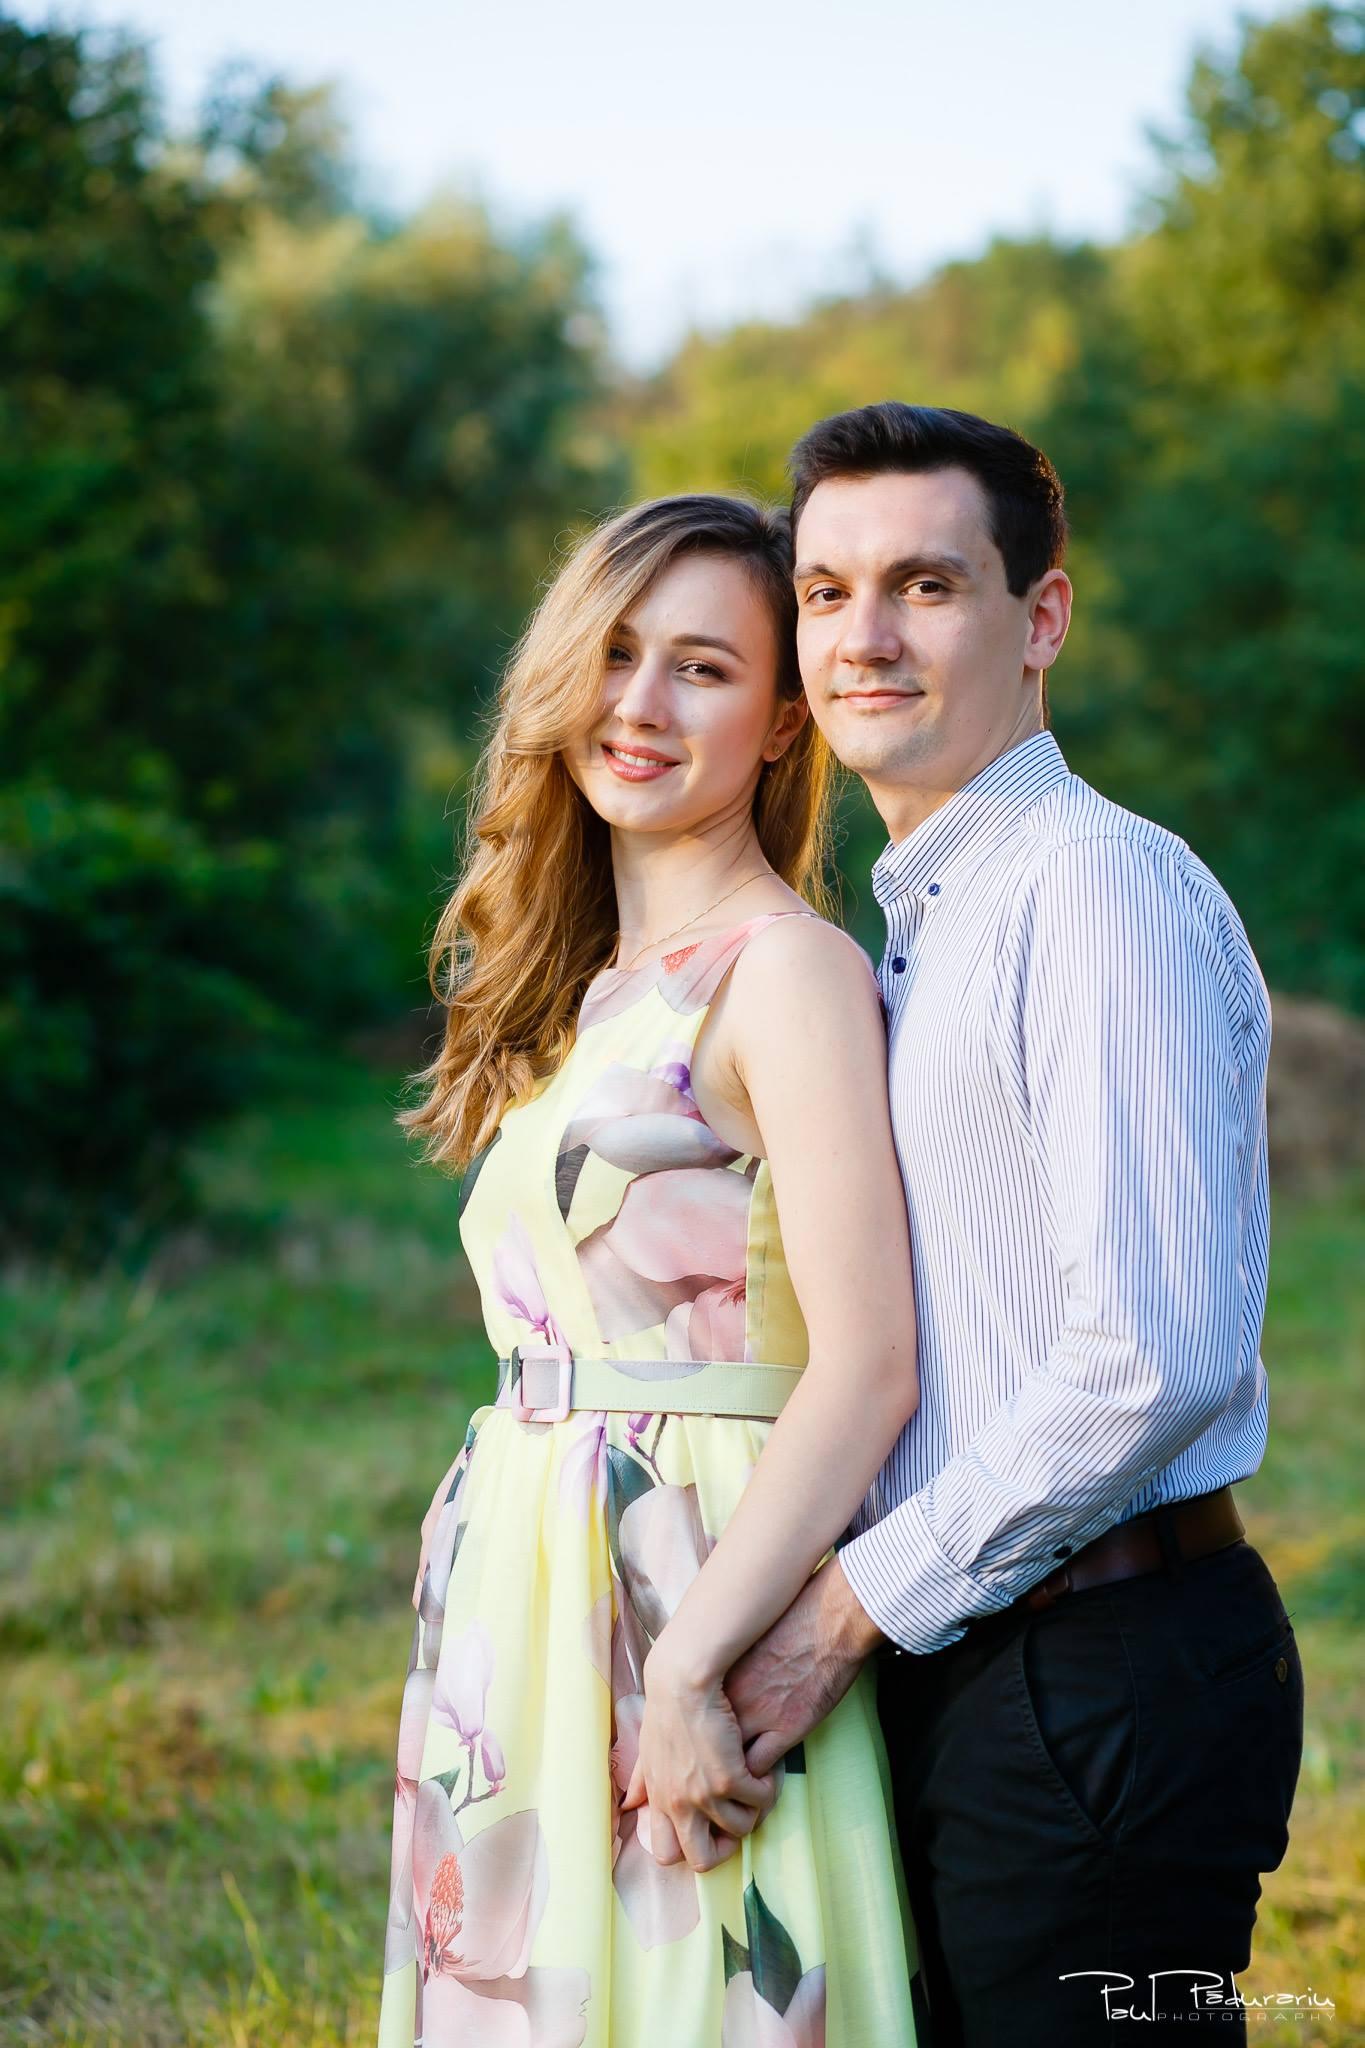 Nicoleta si Catalin - sedinta foto de logodna in Gradina Botanica Iasi - www.paulpadurariu.ro - fotograf profesionist de nunta Iasi 5